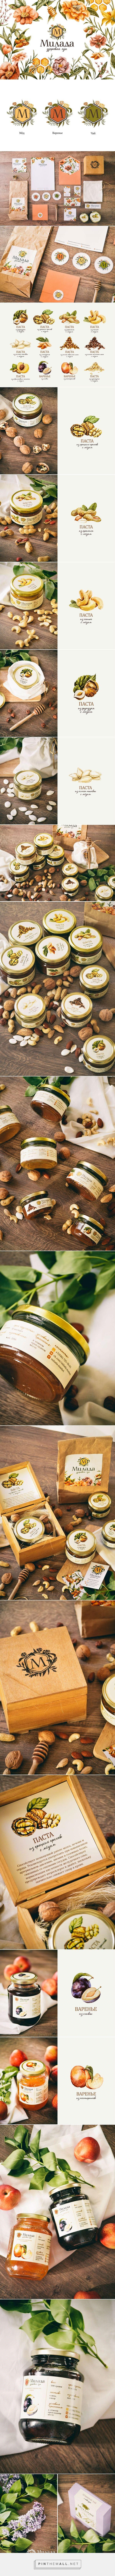 Милада Health Foods Branding and Packaging by Anton Kazakov   Fivestar Branding Agency – Design and Branding Agency & Curated Inspiration Gallery #branding #brand #packaging #packagingdesign #design #designinspiration #foodpackaging